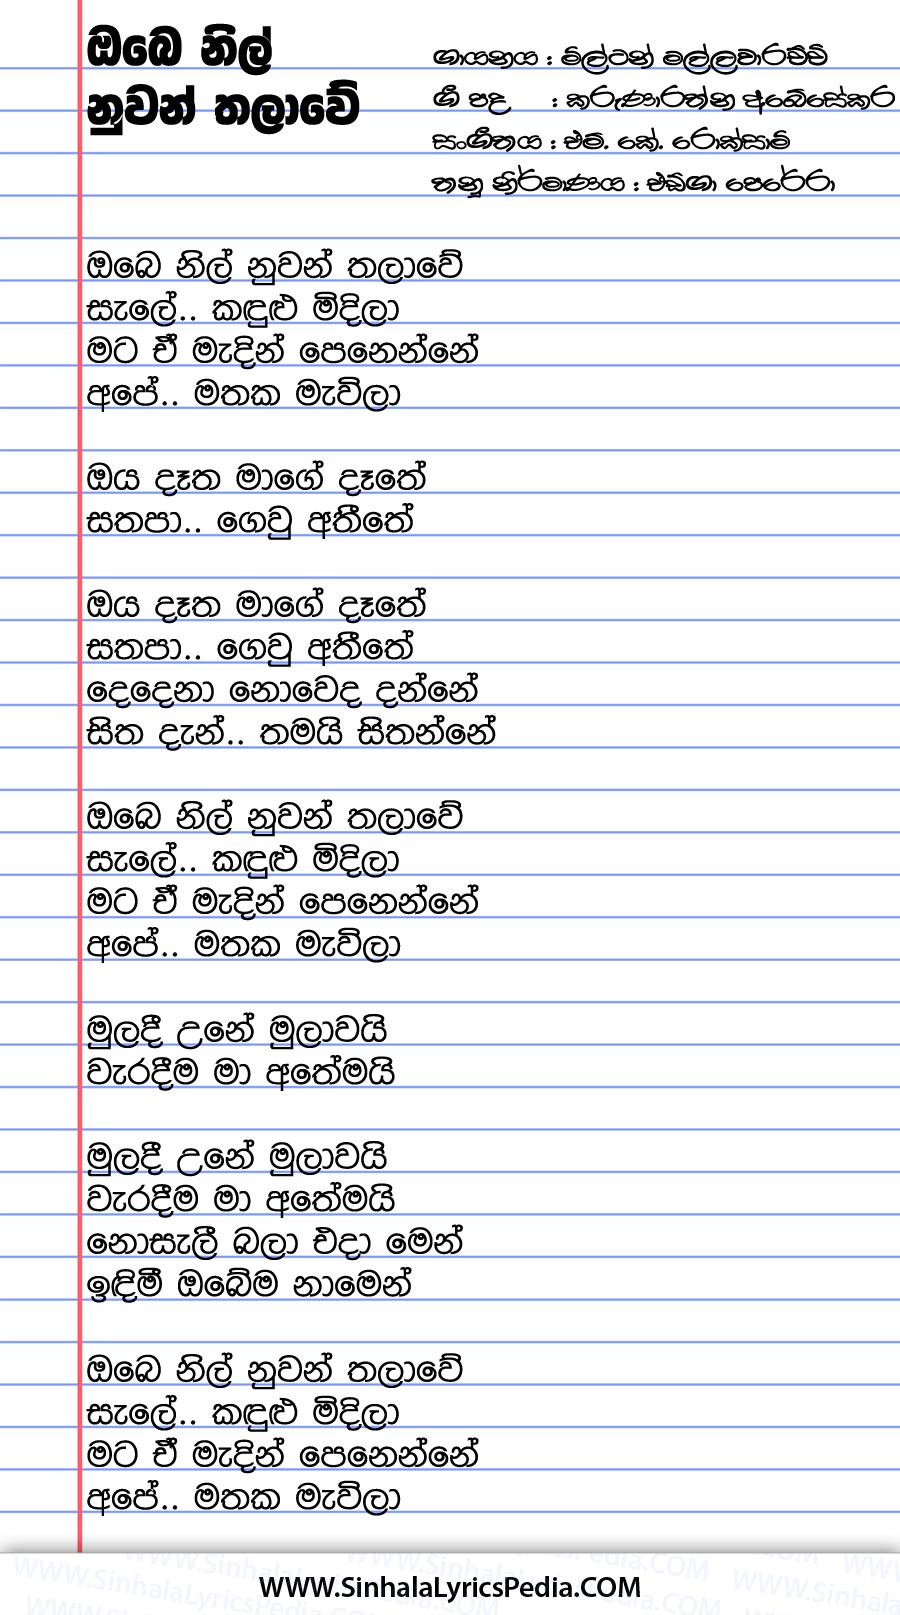 Obe Nil Nuwan Thalawe Sale Kandulu Midila Song Lyrics